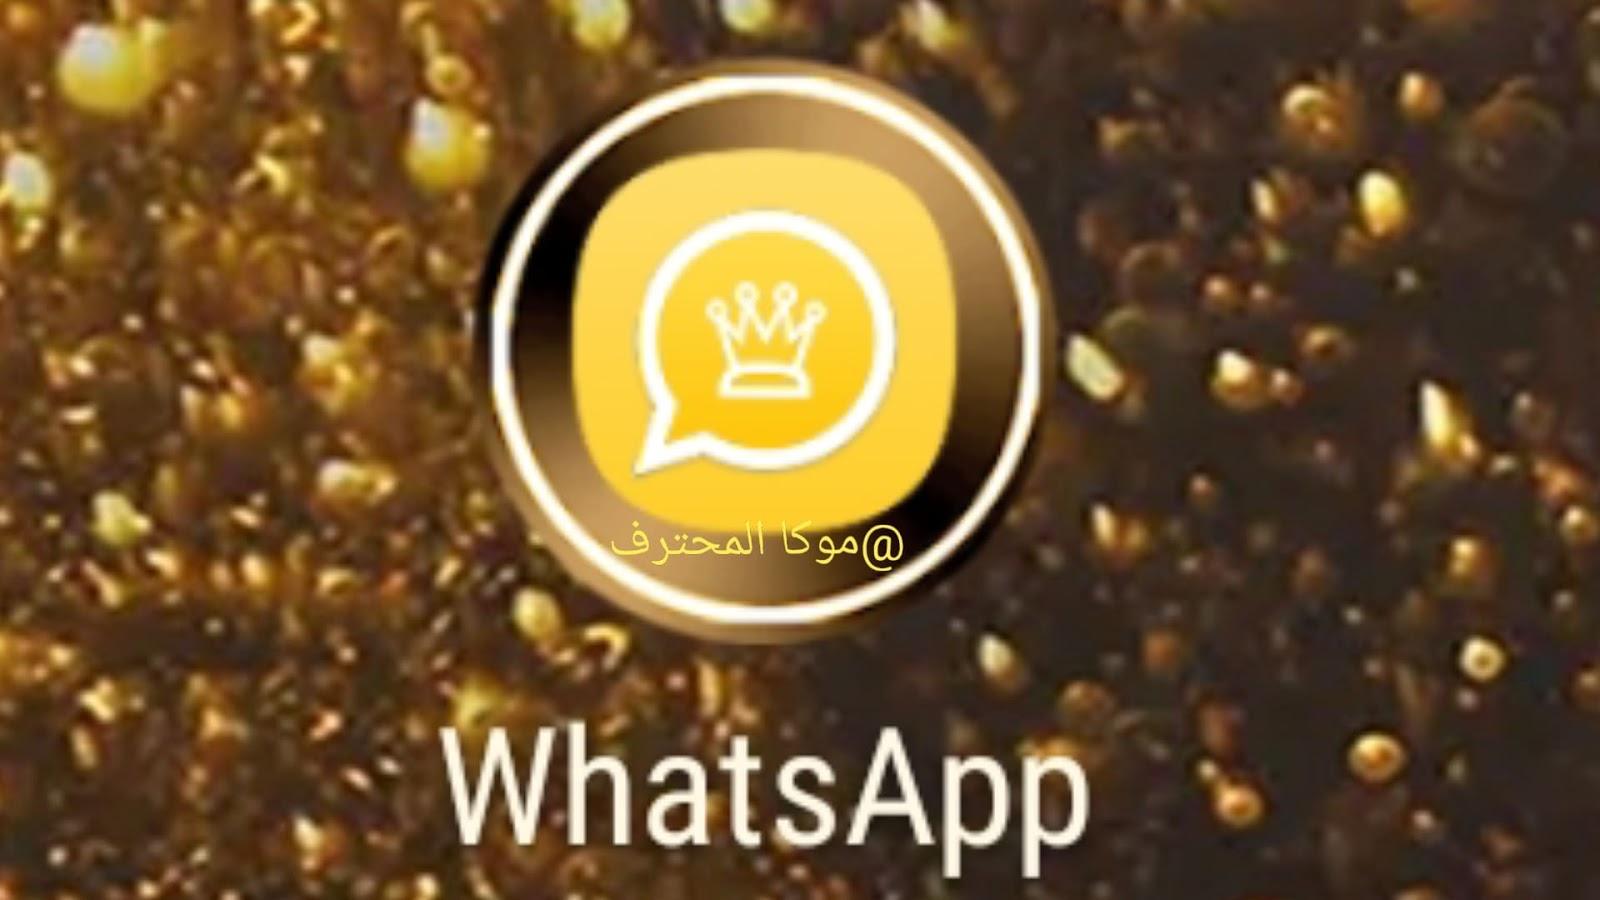 تحميل واتساب الذهبي  Whatsapp Gold V8.10 اخر تحديث 2020 برابط مباشر.